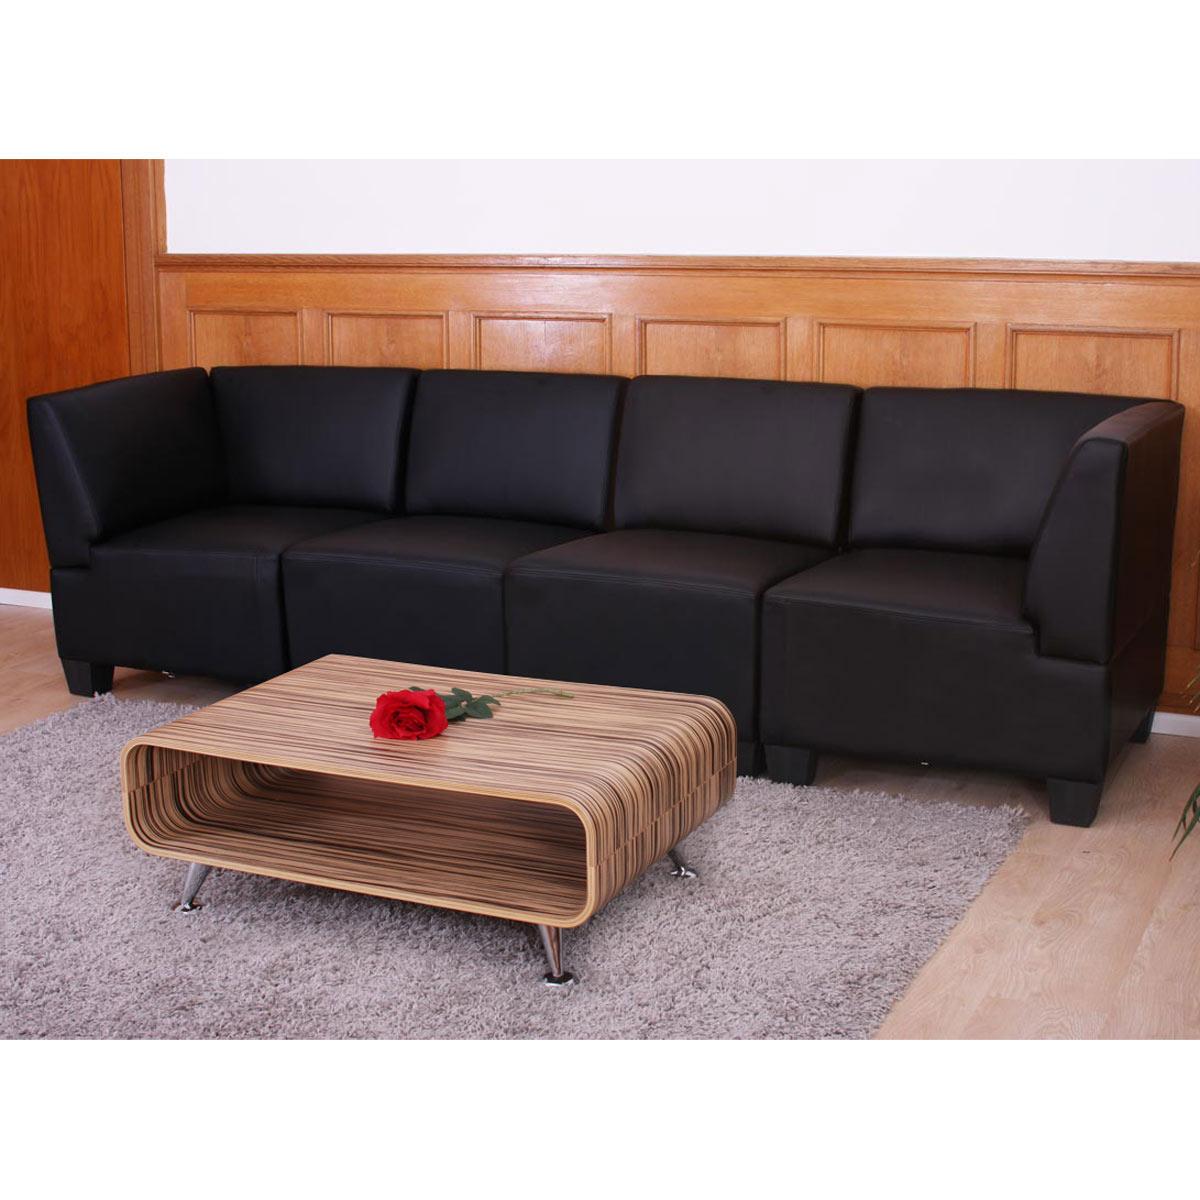 modular 4 sitzer sofa couch lyon kunstleder schwarz hohe armlehnen. Black Bedroom Furniture Sets. Home Design Ideas